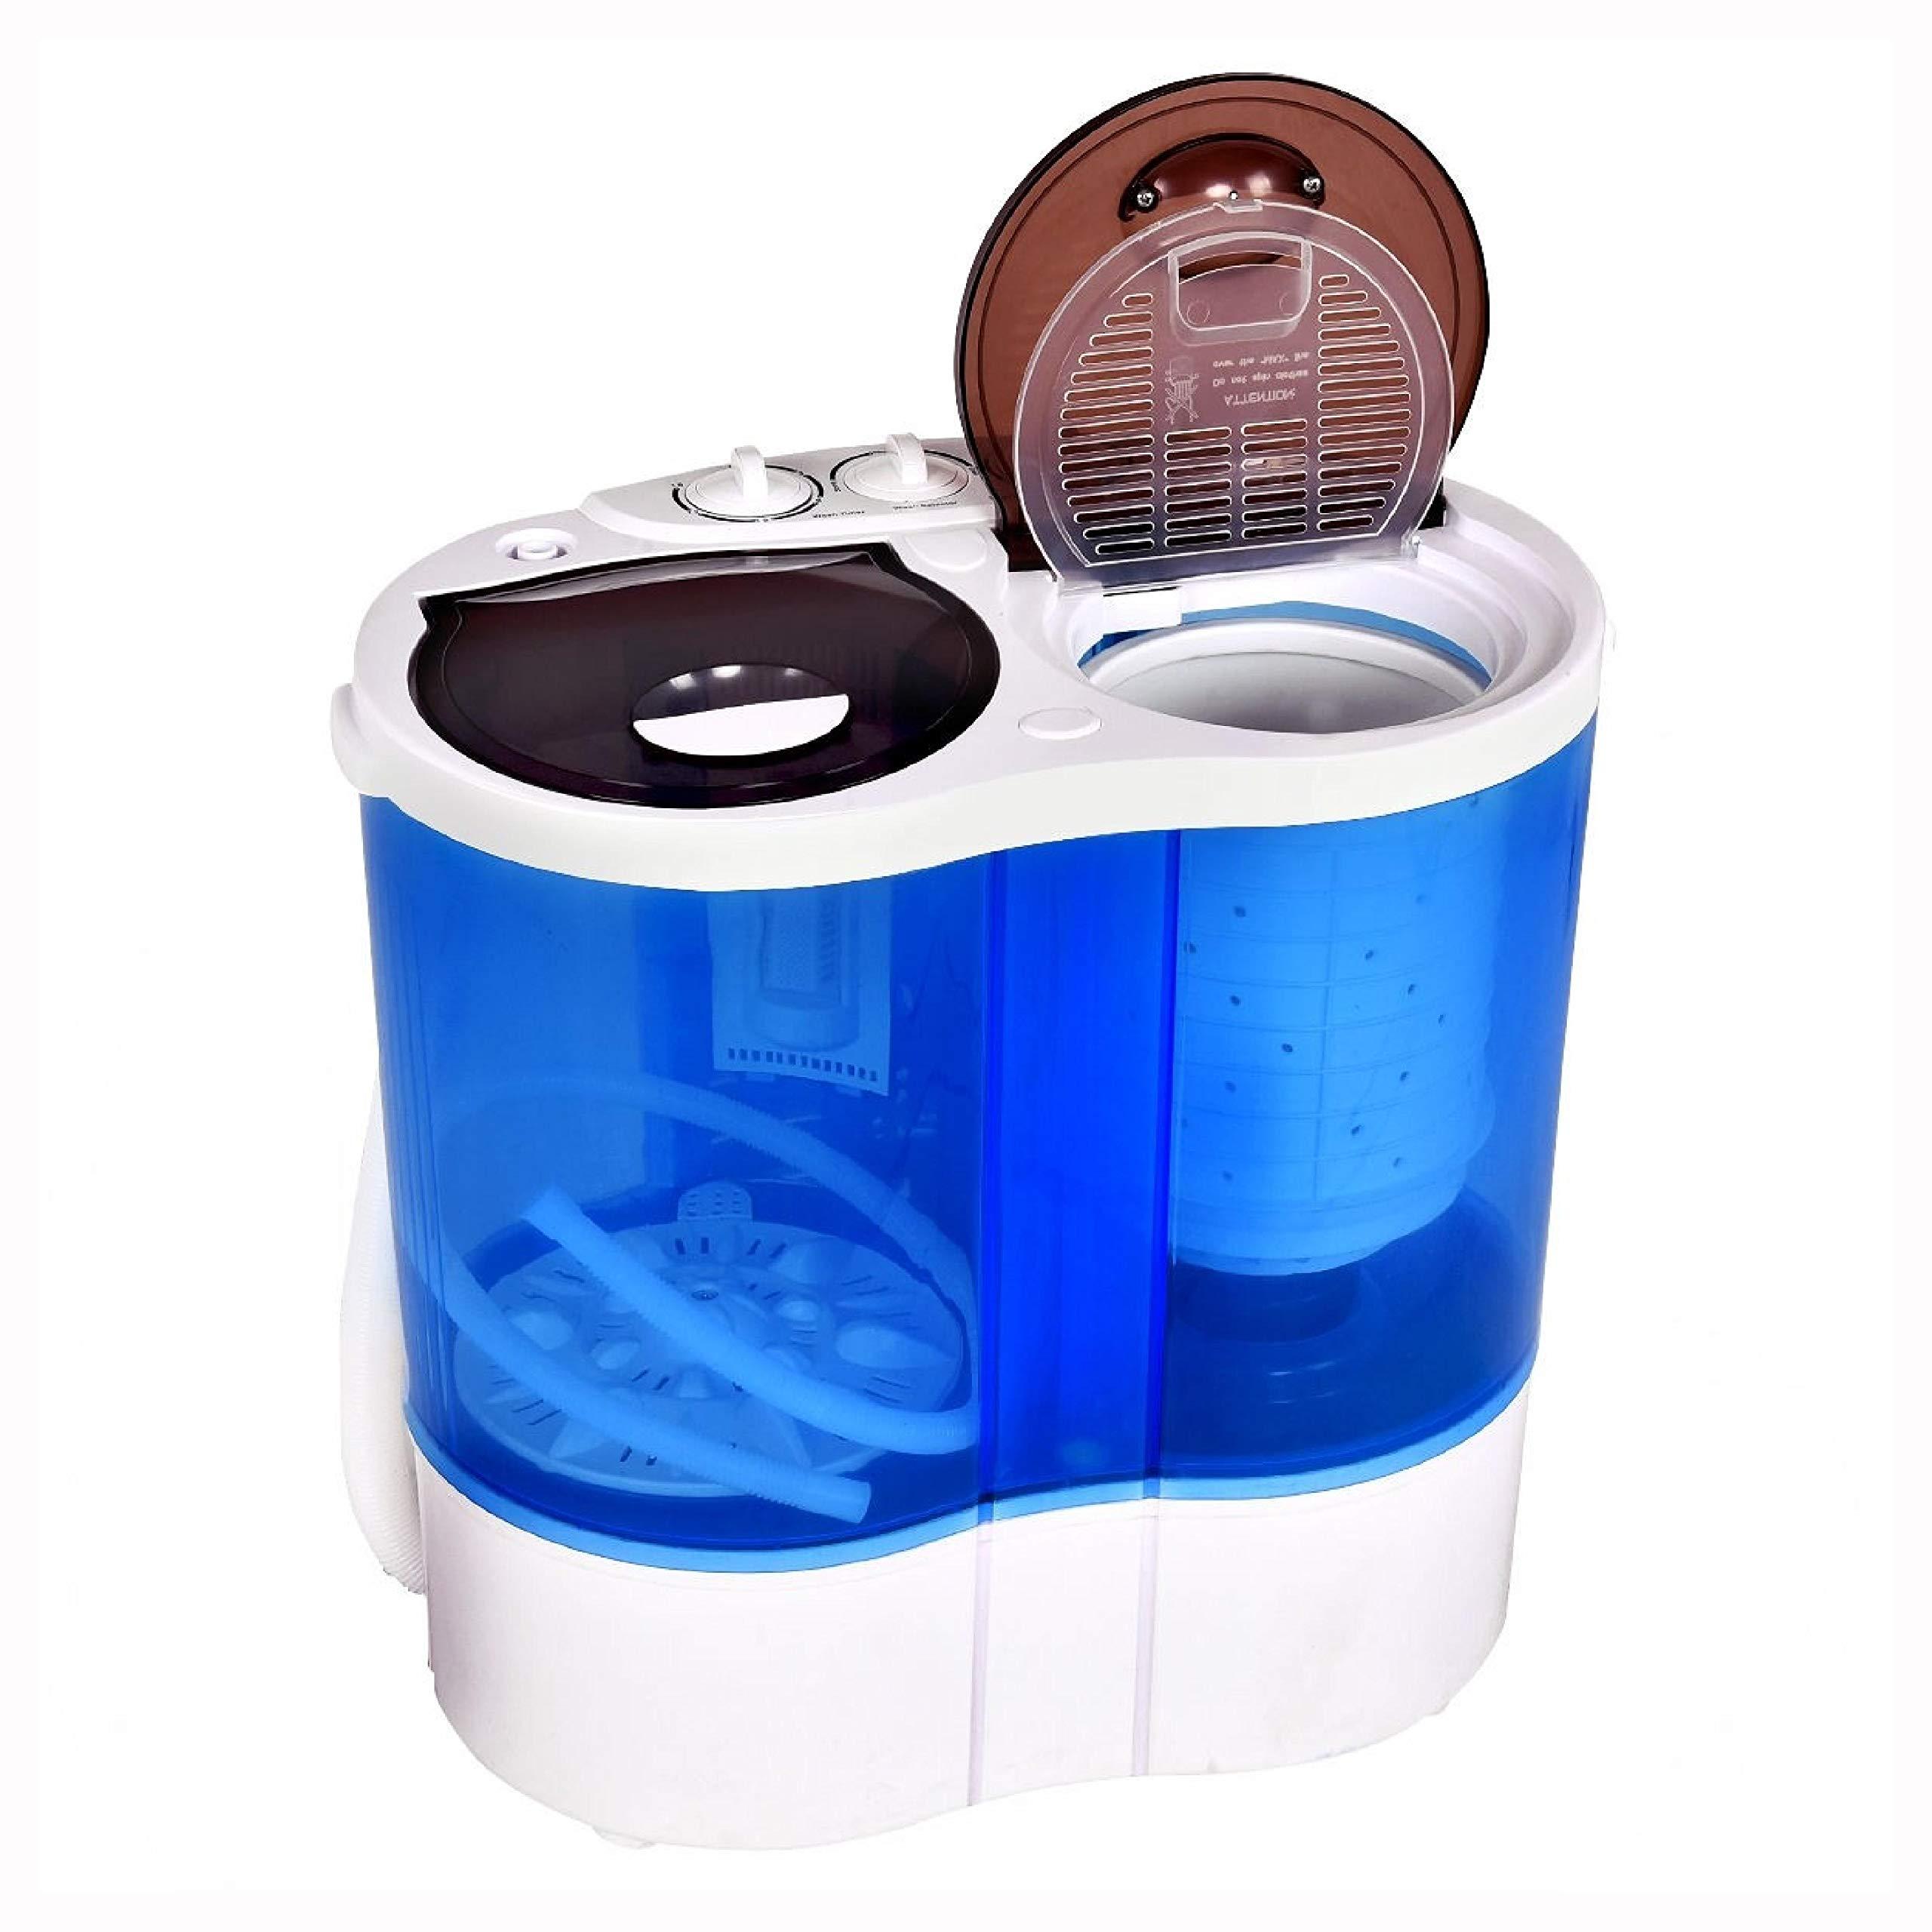 Washing Machine, 15 lbs Portable Compact Twin Tub Mini Washing Machine by HomyDelight (Image #9)